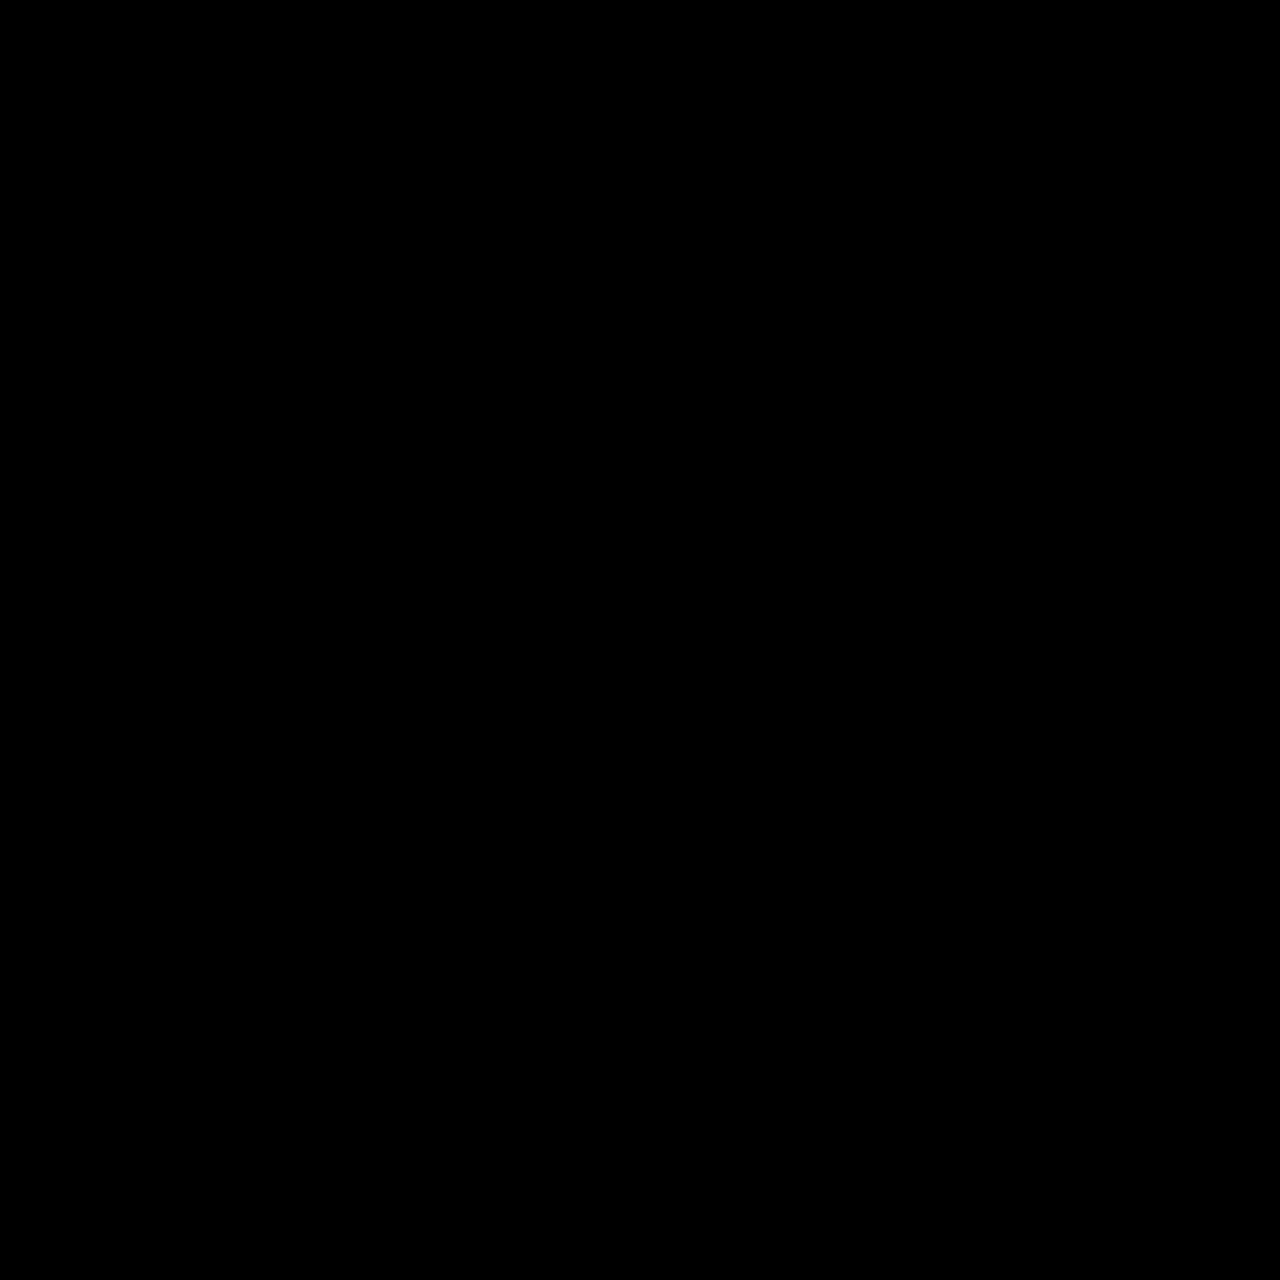 B5M516NC114 (784212)